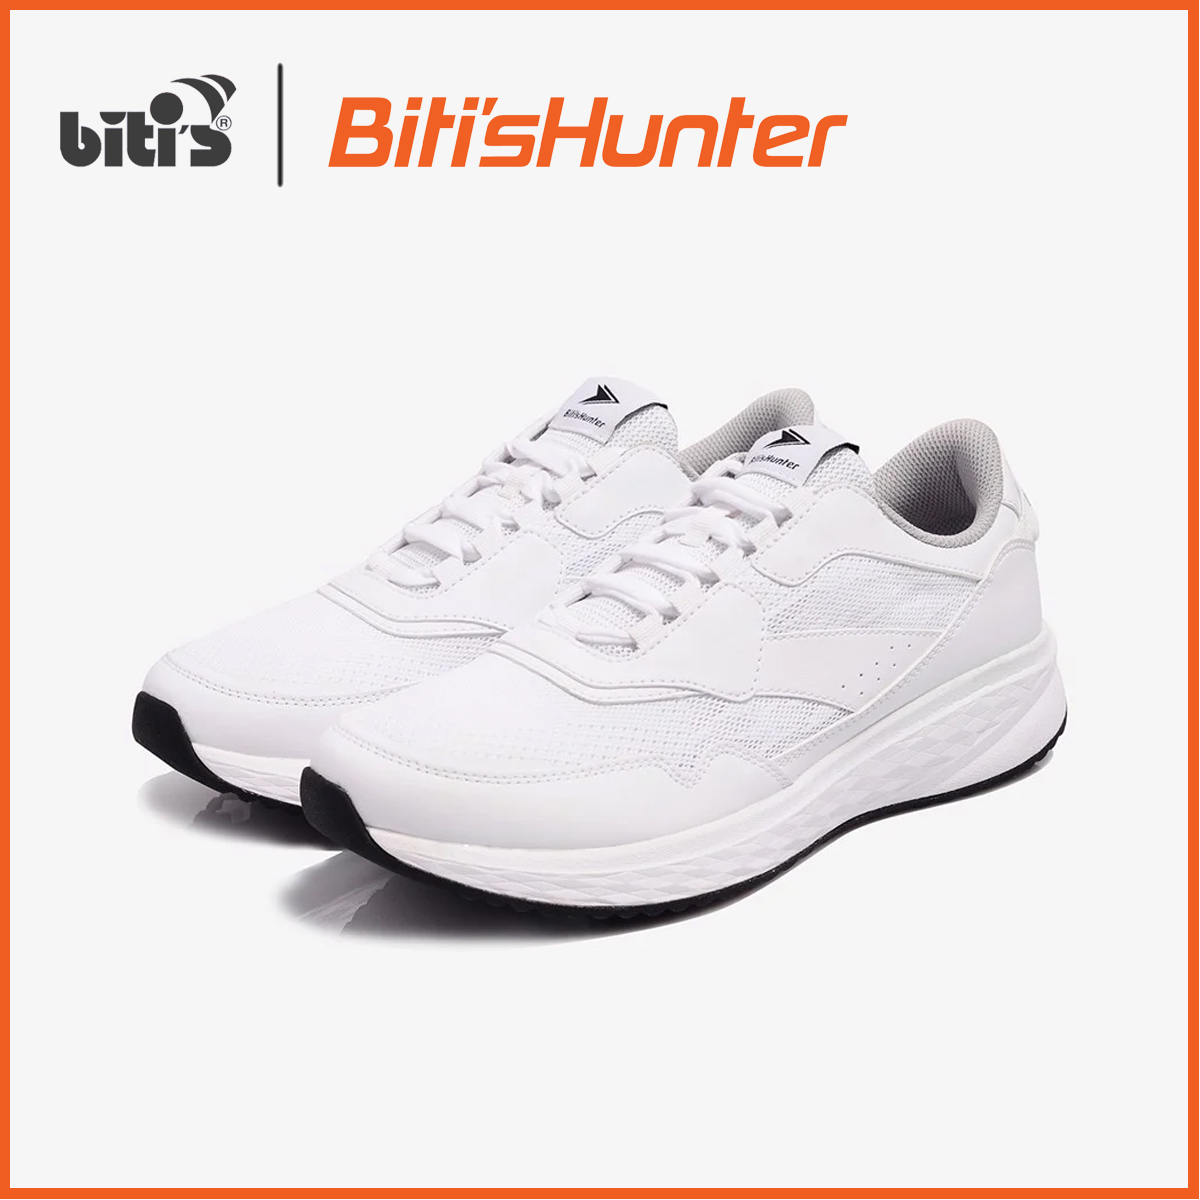 Giày Thể Thao Nam Biti's Hunter Core White Snow DSMH01201TRG- Festive Collection 2k19